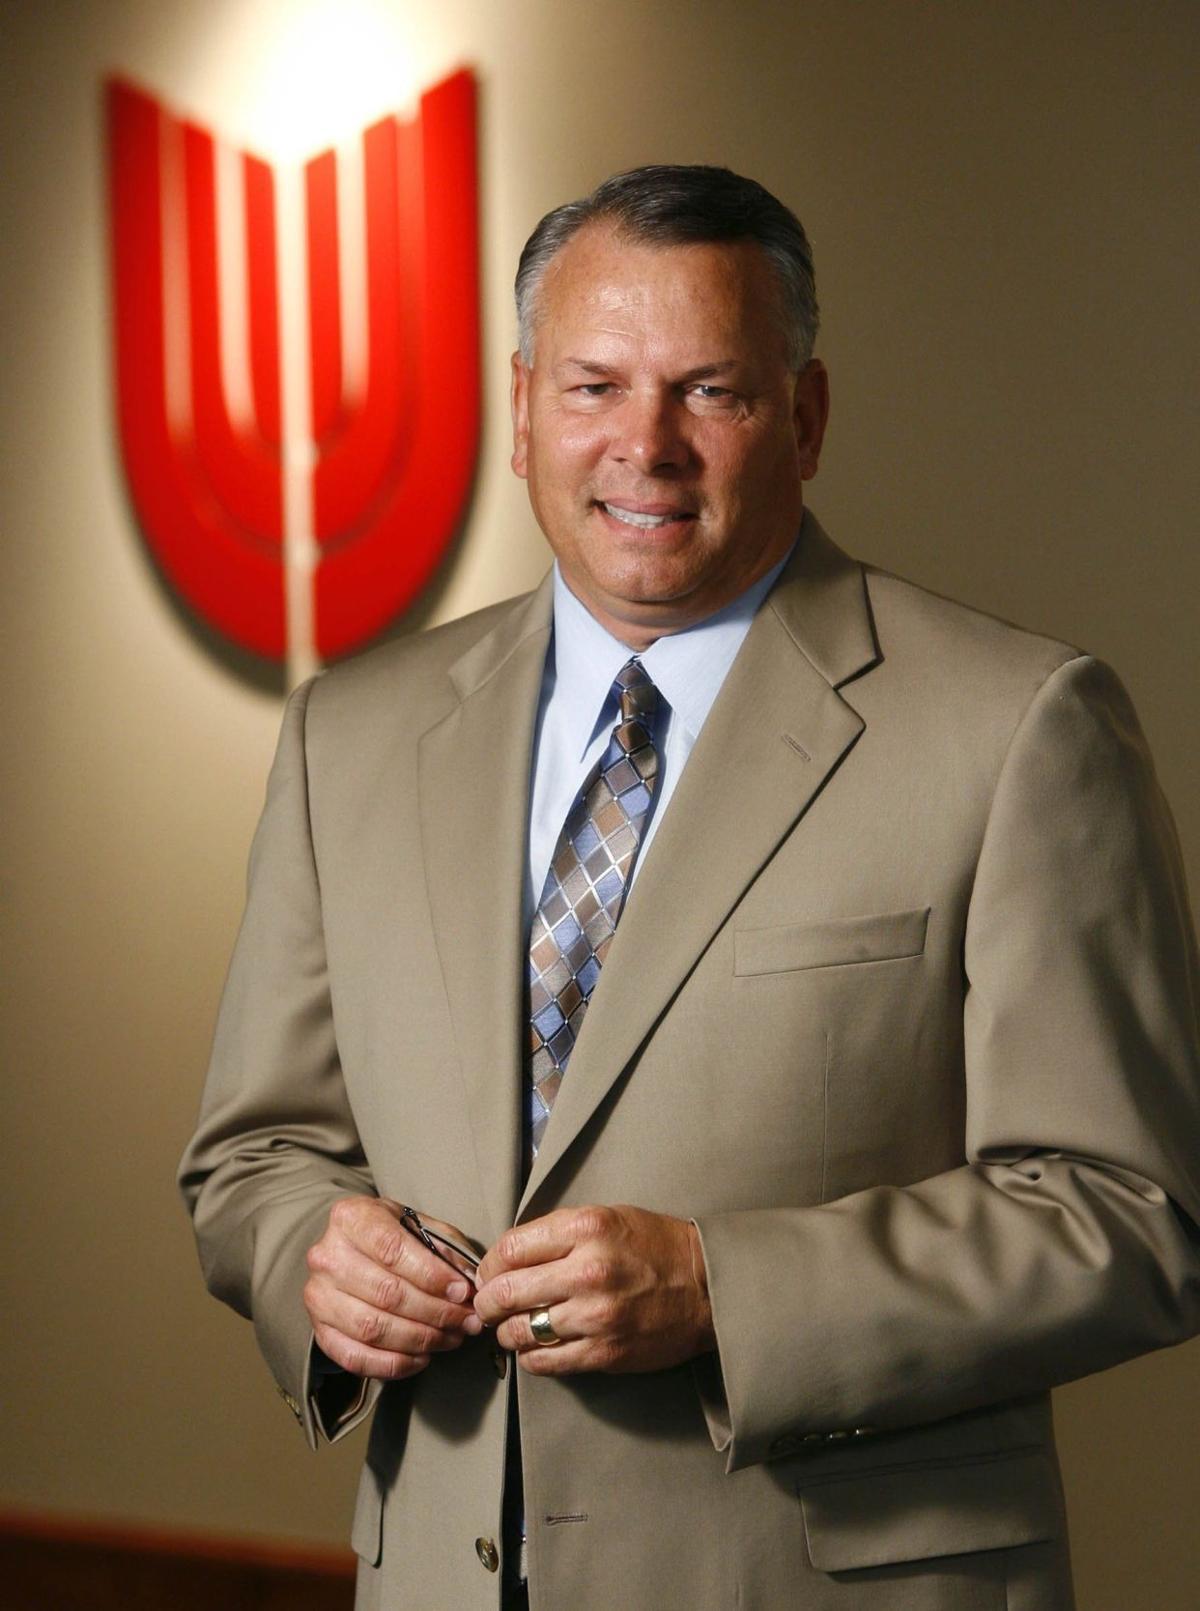 Kirt Hartzler takes over as superintendent at Union Public Schools